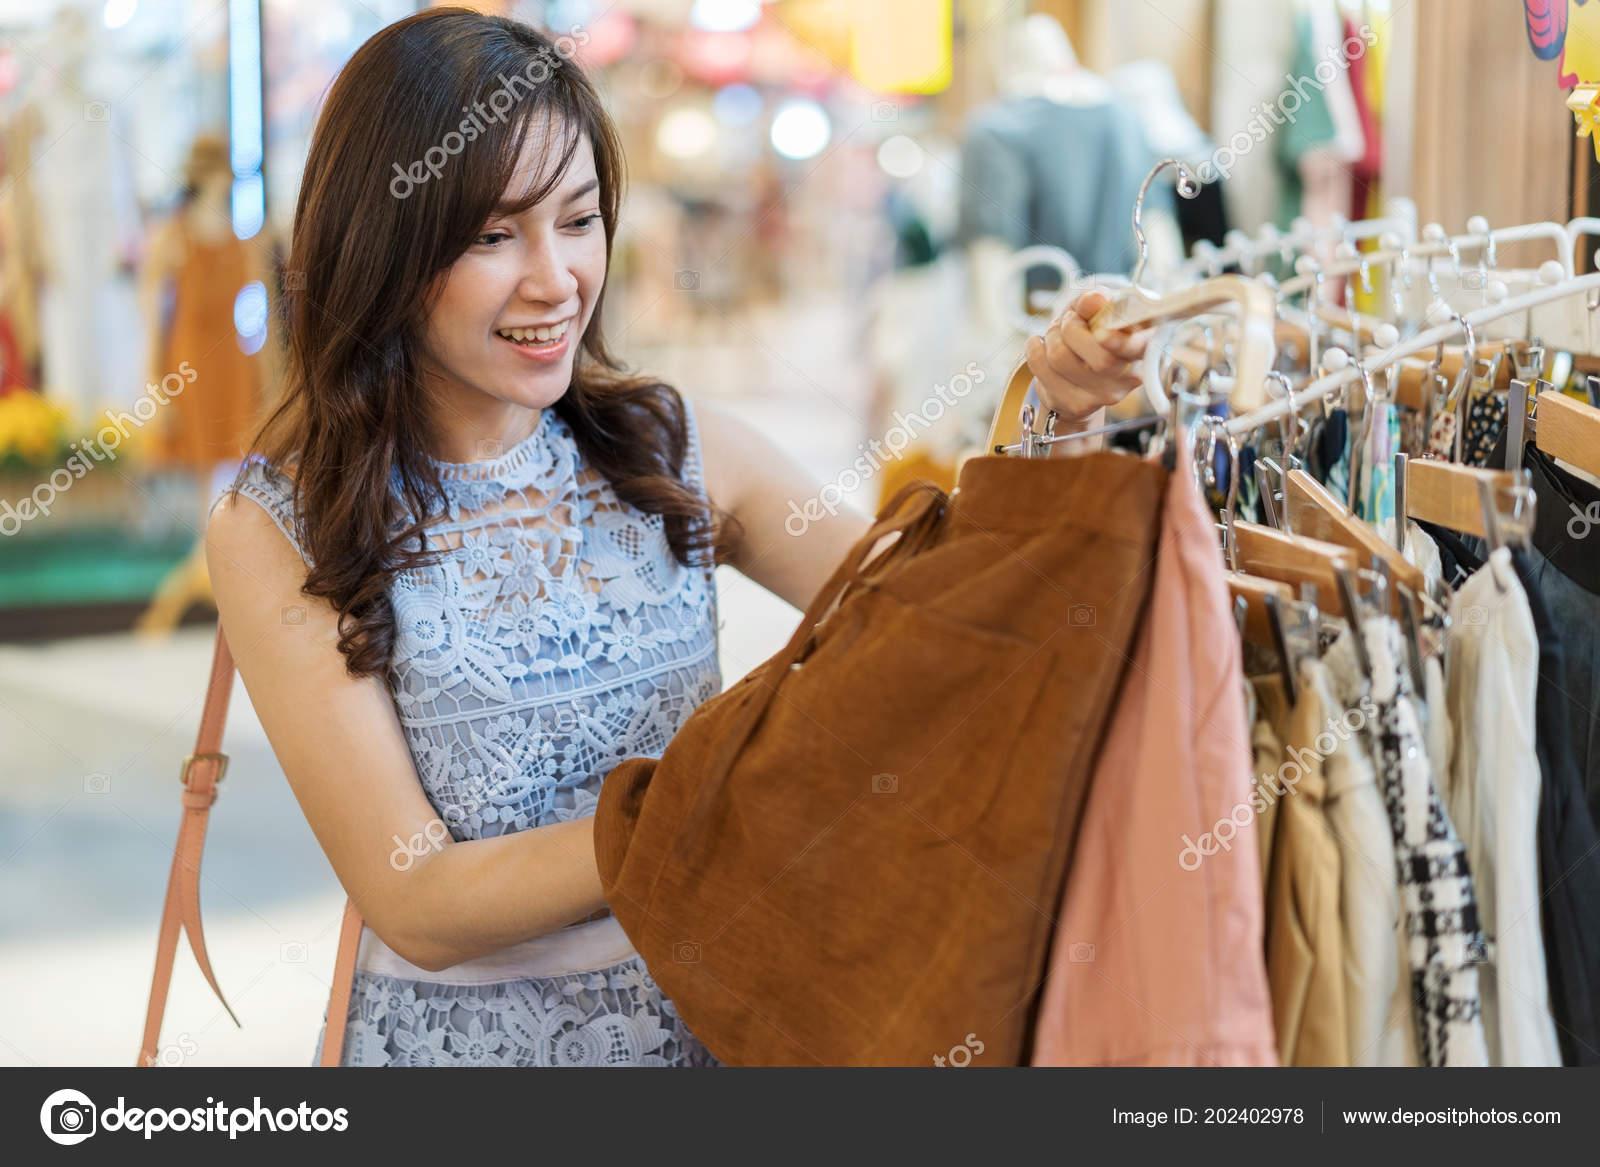 651e09fc1bd30 Young Woman Shopping Clothing Store — Stock Photo © geargodz #202402978